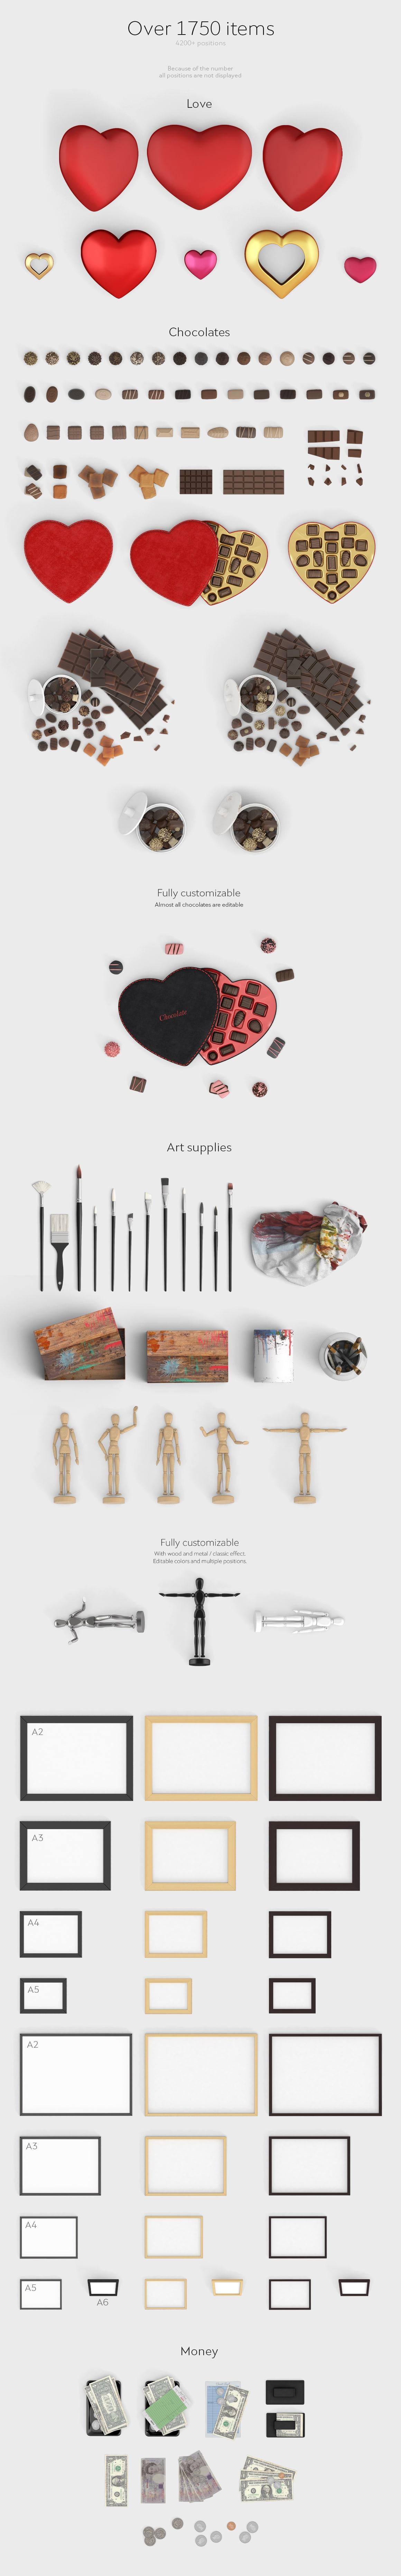 creative-market-scene-creator-bundle-11